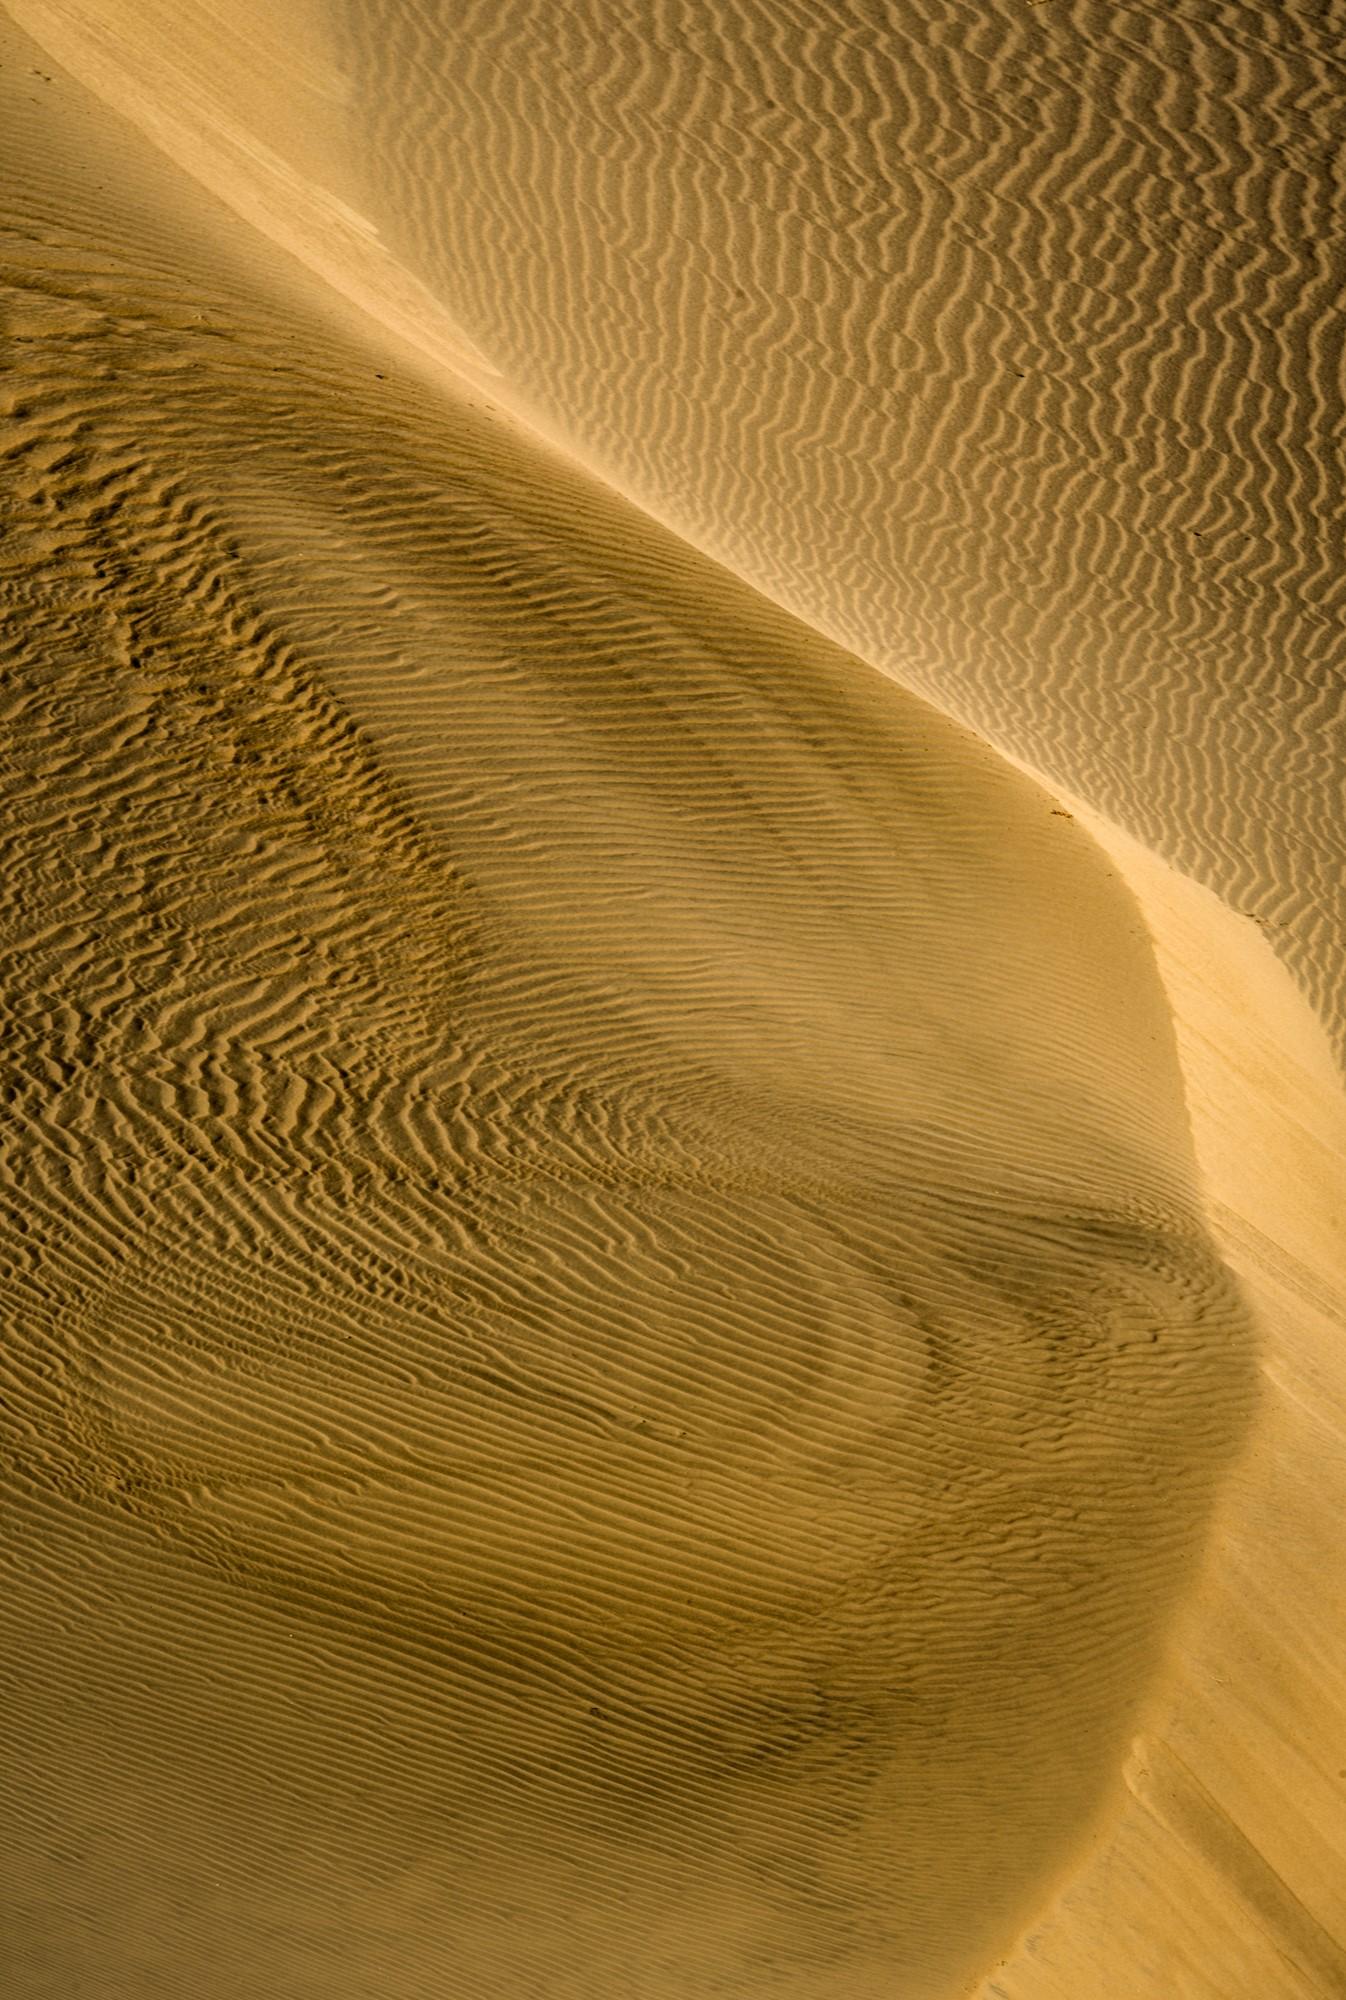 Ann Beard - Visionary Death Valley: Jan 2018